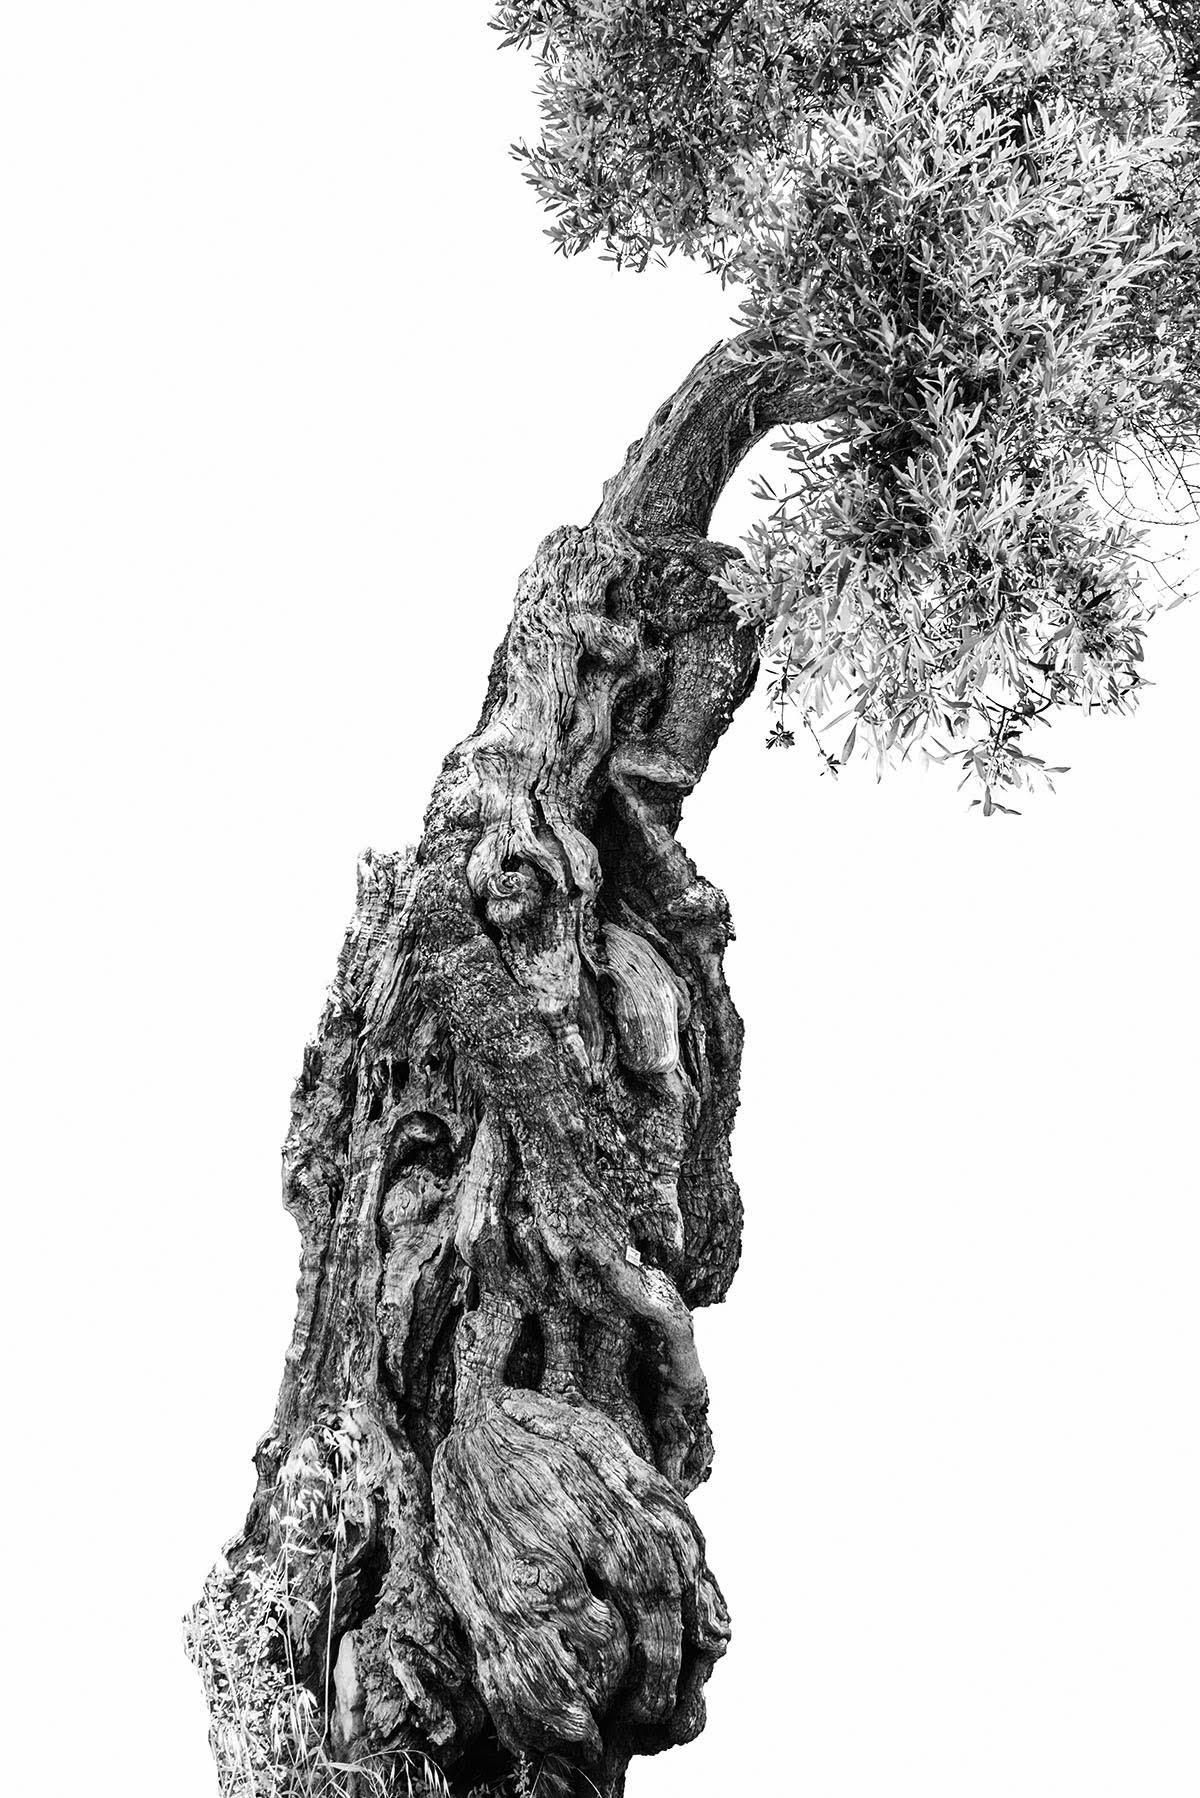 martin-ogolter-Monumentali-nature-landscape-photographer-18